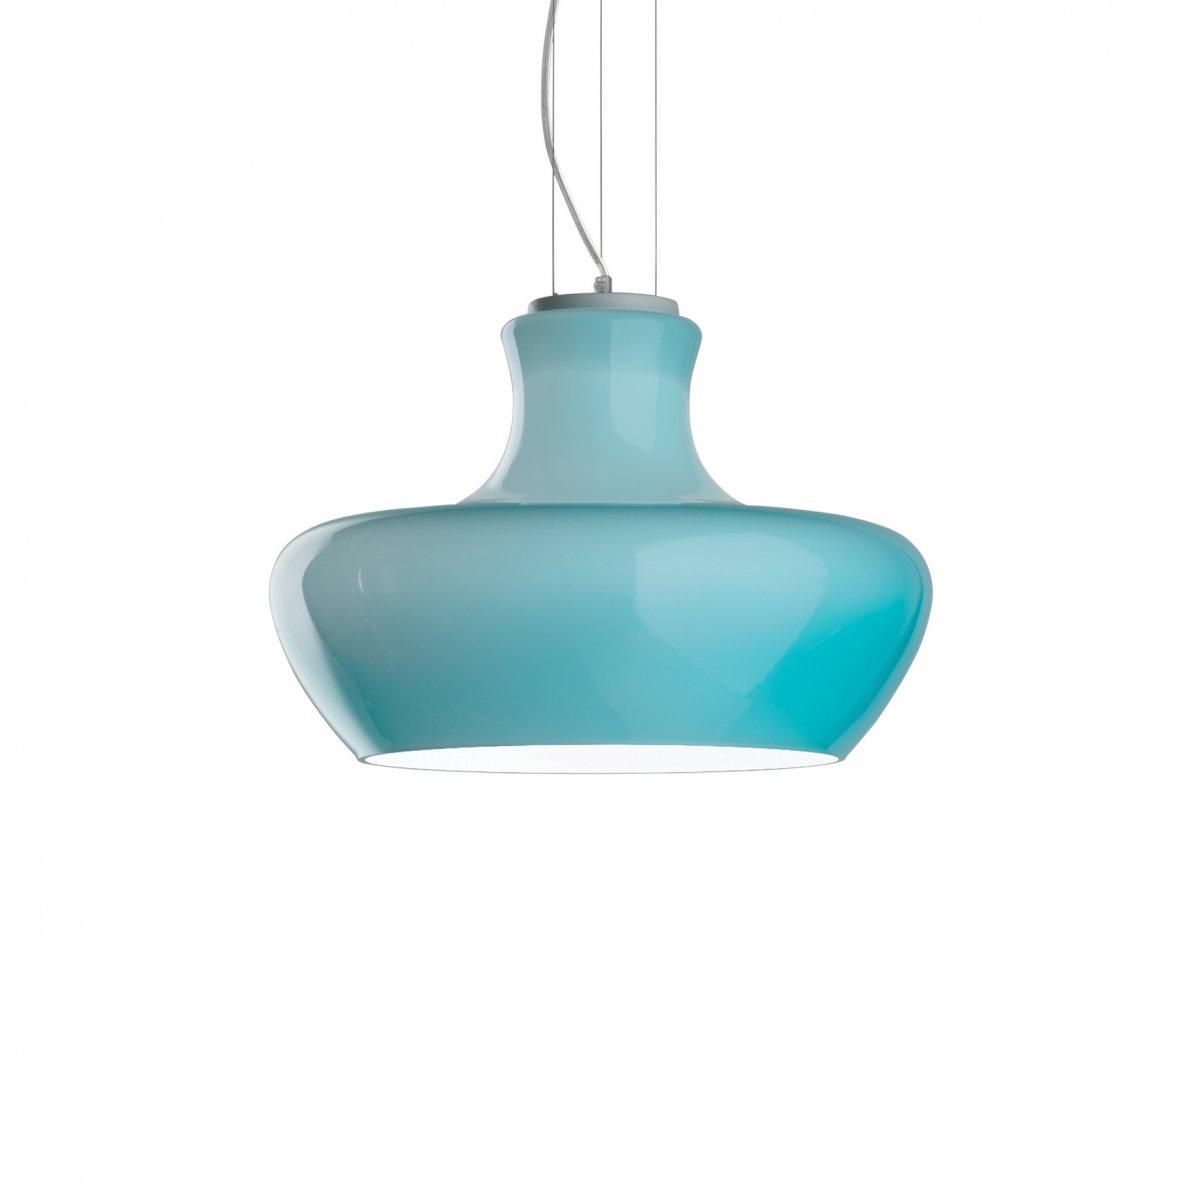 Ideal Lux ALADINO SP1 D45 AZZURRO LAMPADA A SOSPENSIONE 1 LUCE